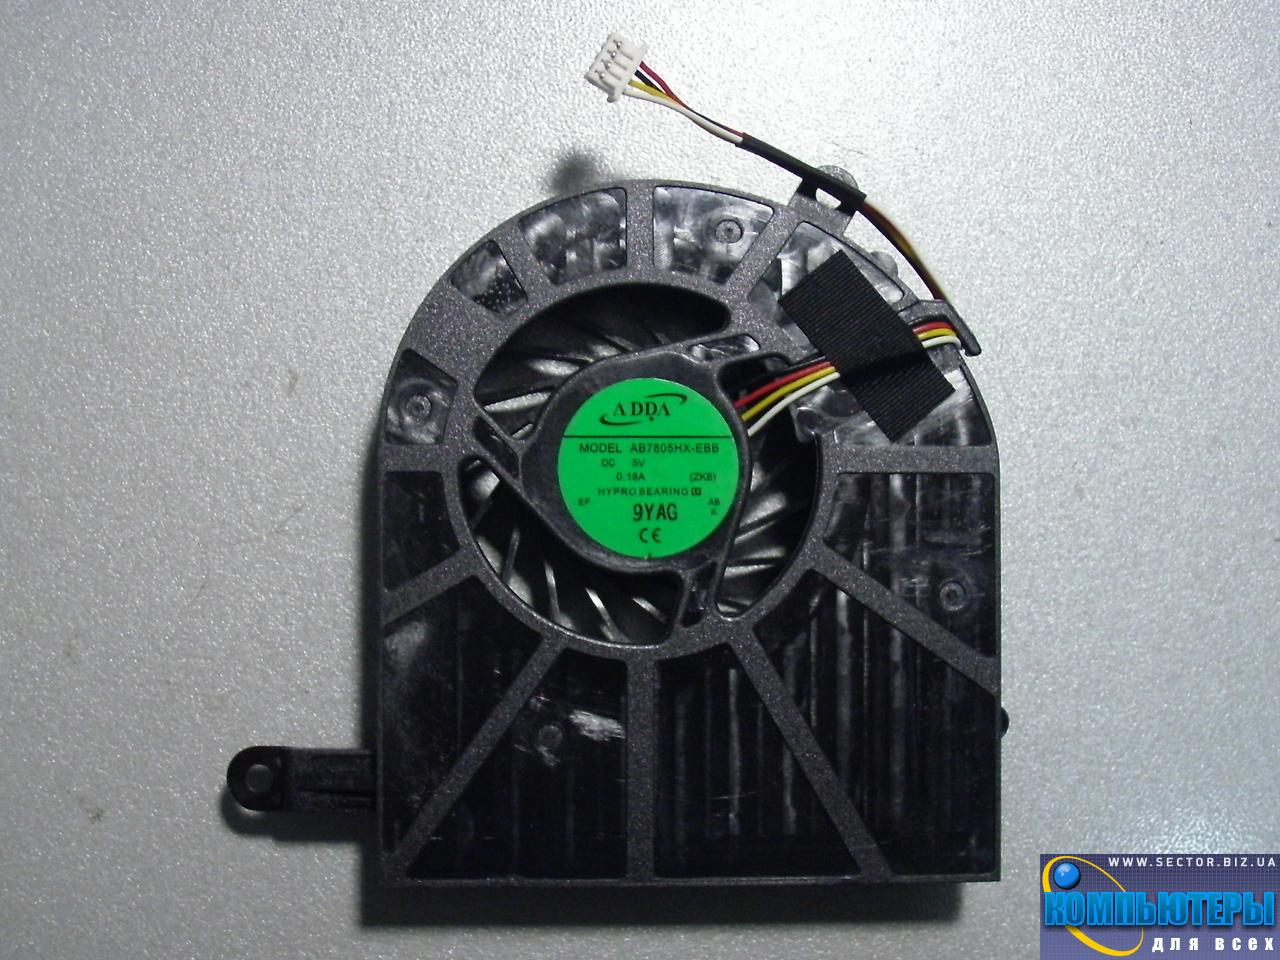 Кулер к ноутбуку Acer Aspire 5739 5739G p/n: AB7805HX-EBB (ZK6). Фото № 4.